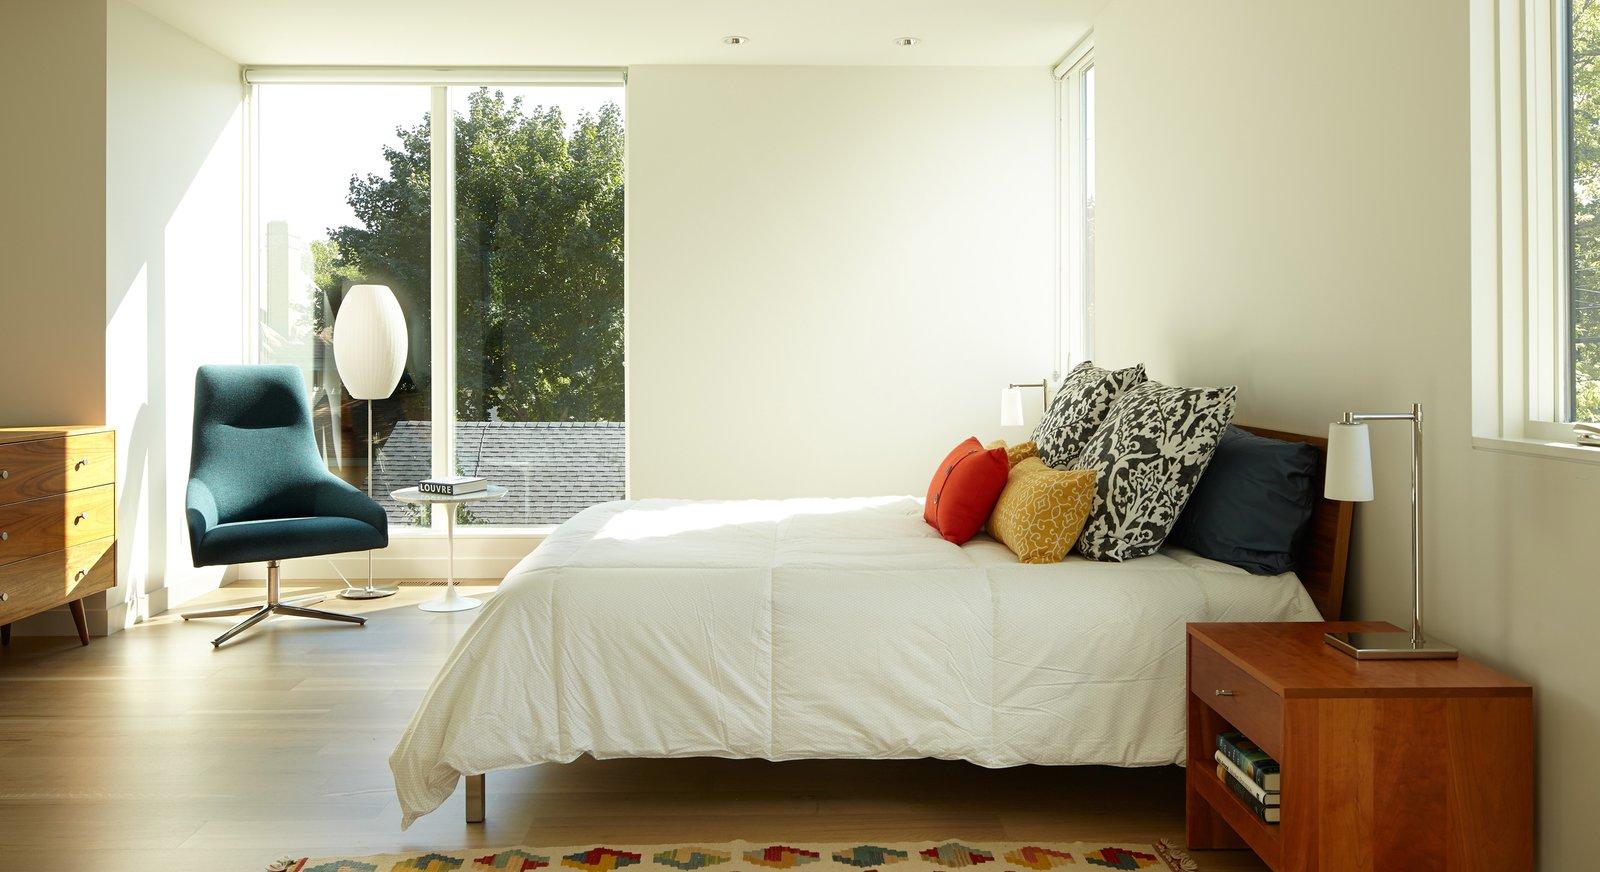 Tagged: Bedroom, Bed, Accent Lighting, Table Lighting, Light Hardwood Floor, and Floor Lighting.  Sheridan Residence by Peterssen/Keller Architecture